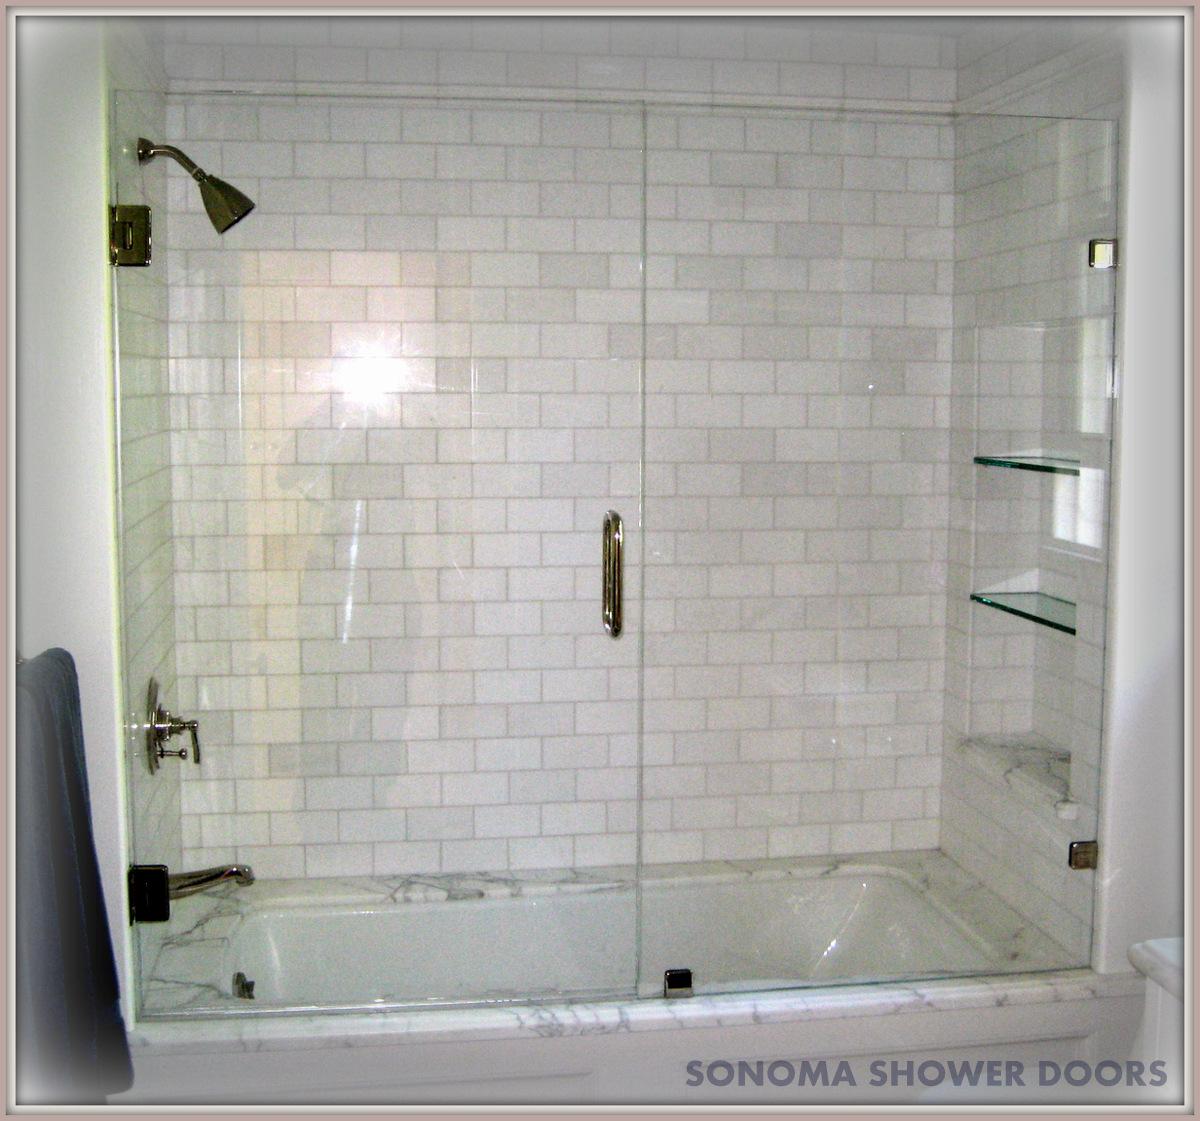 Home Sonoma Shower Doors